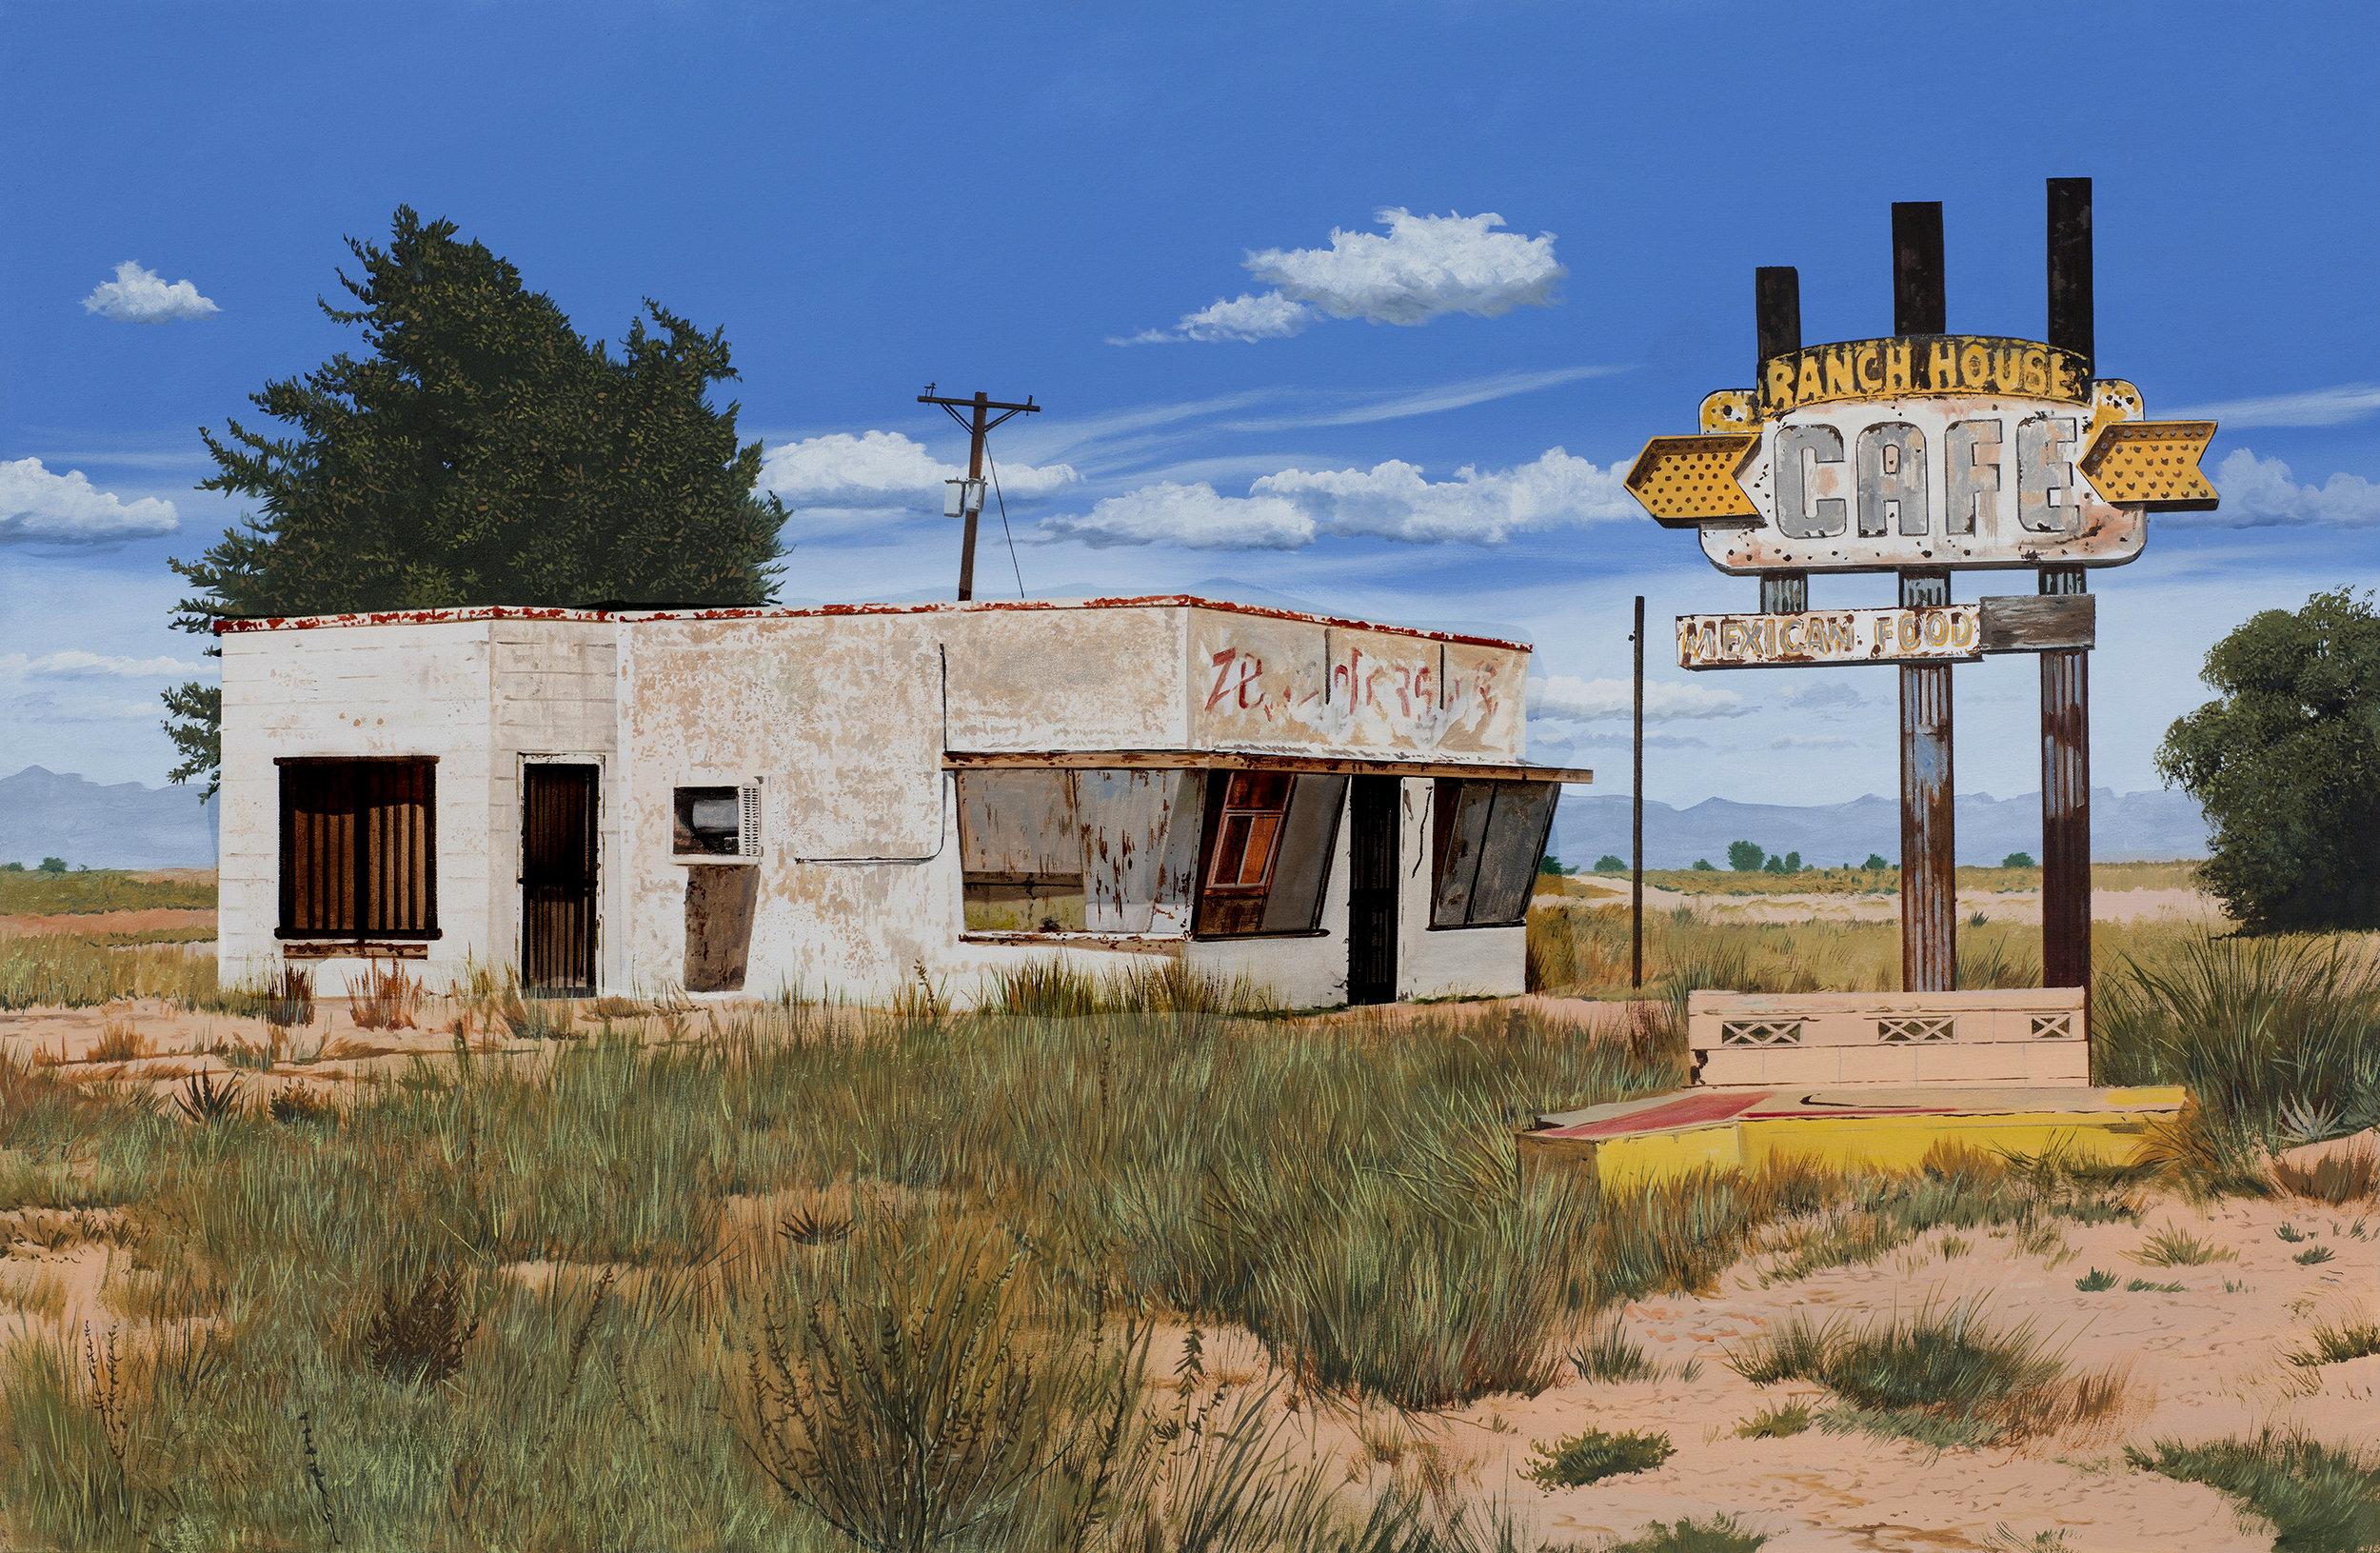 "Daniel Blagg, Tucumcari , 2016, oil on canvas, 38 x 58"". Contact Artspace111 to purchase."